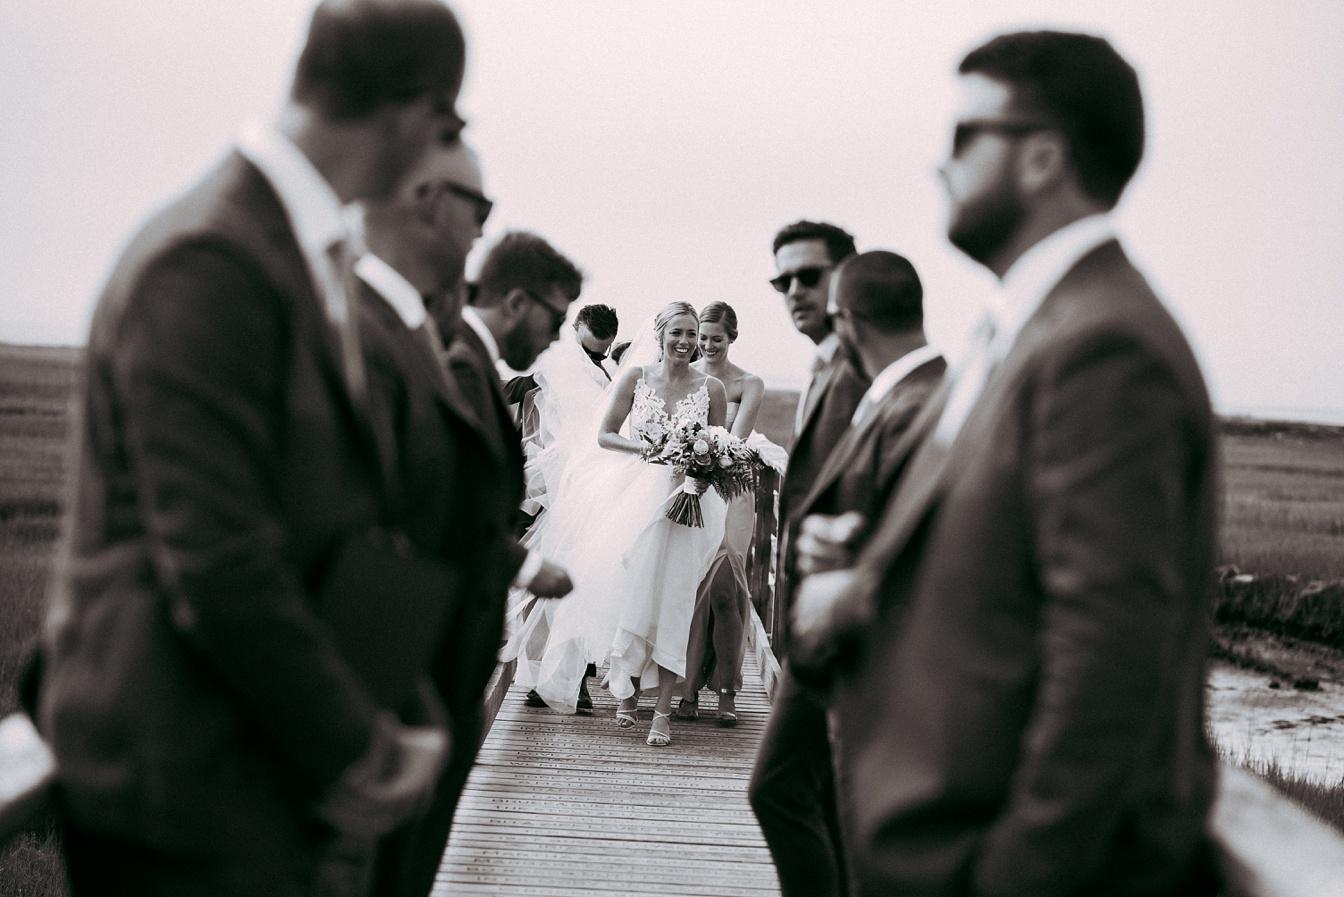 Eliza_Ben_Wedding_The_Foxes_Photography_189.jpg